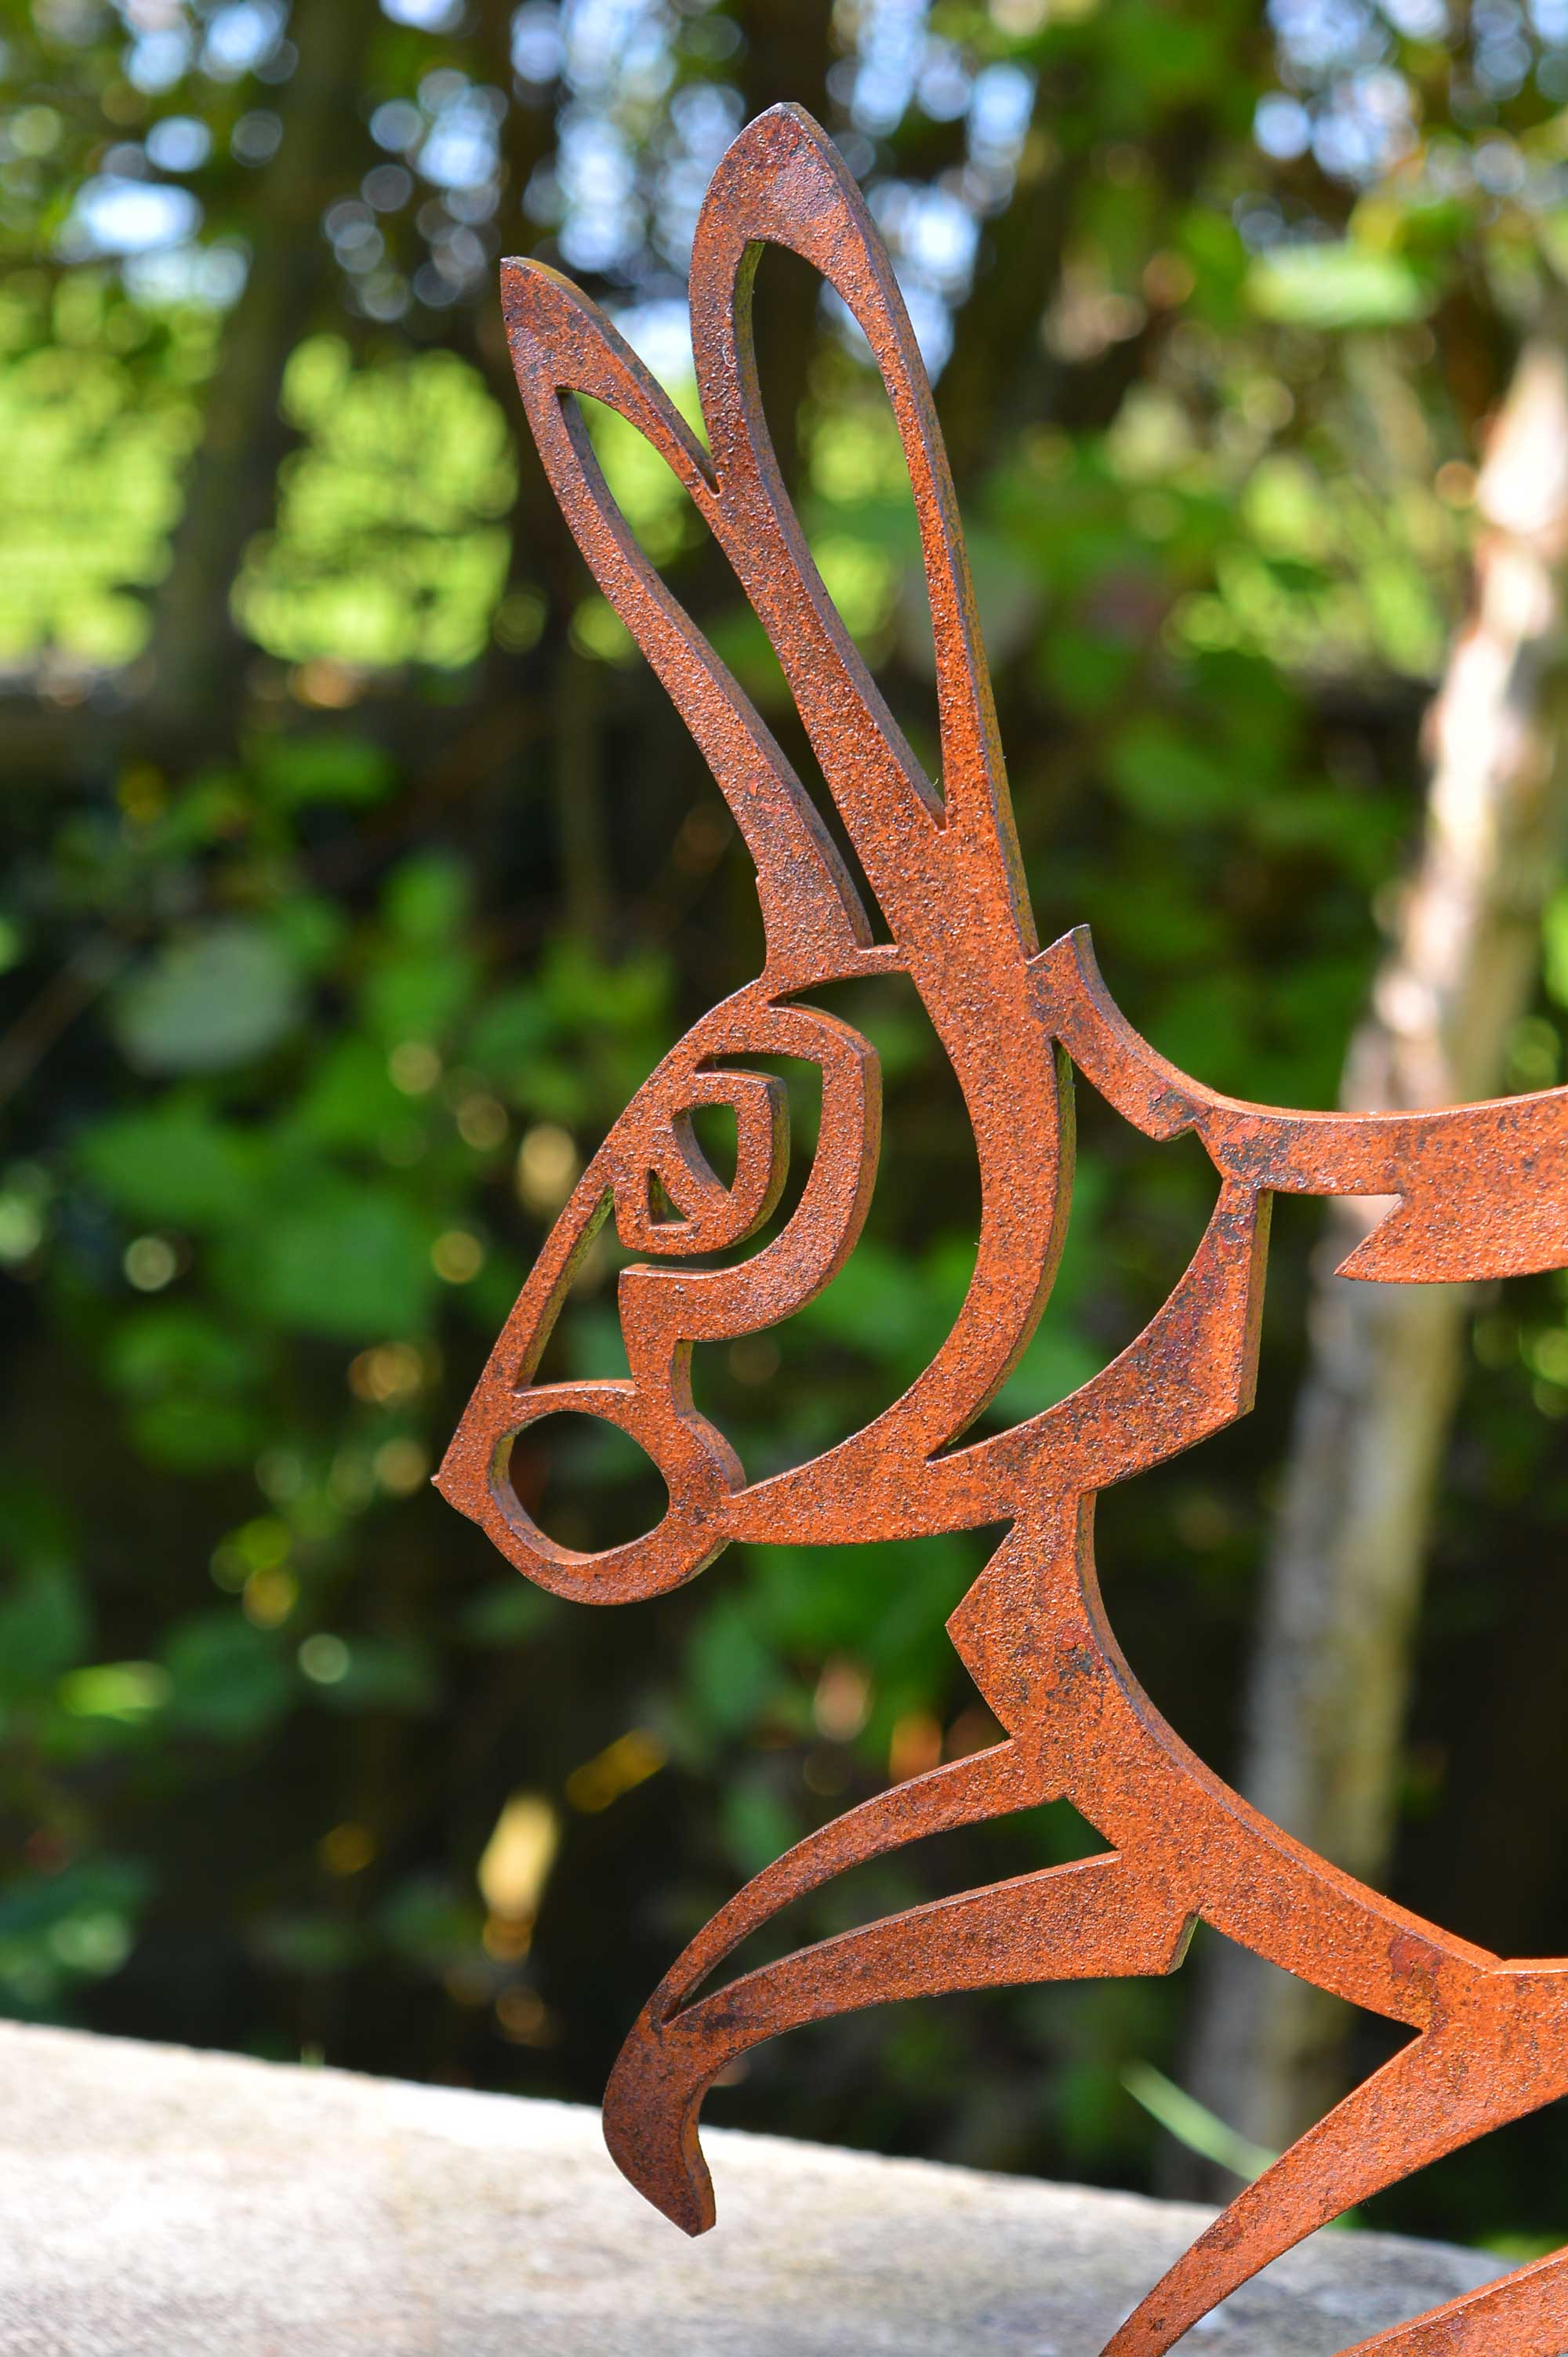 Hare sculpture head detail